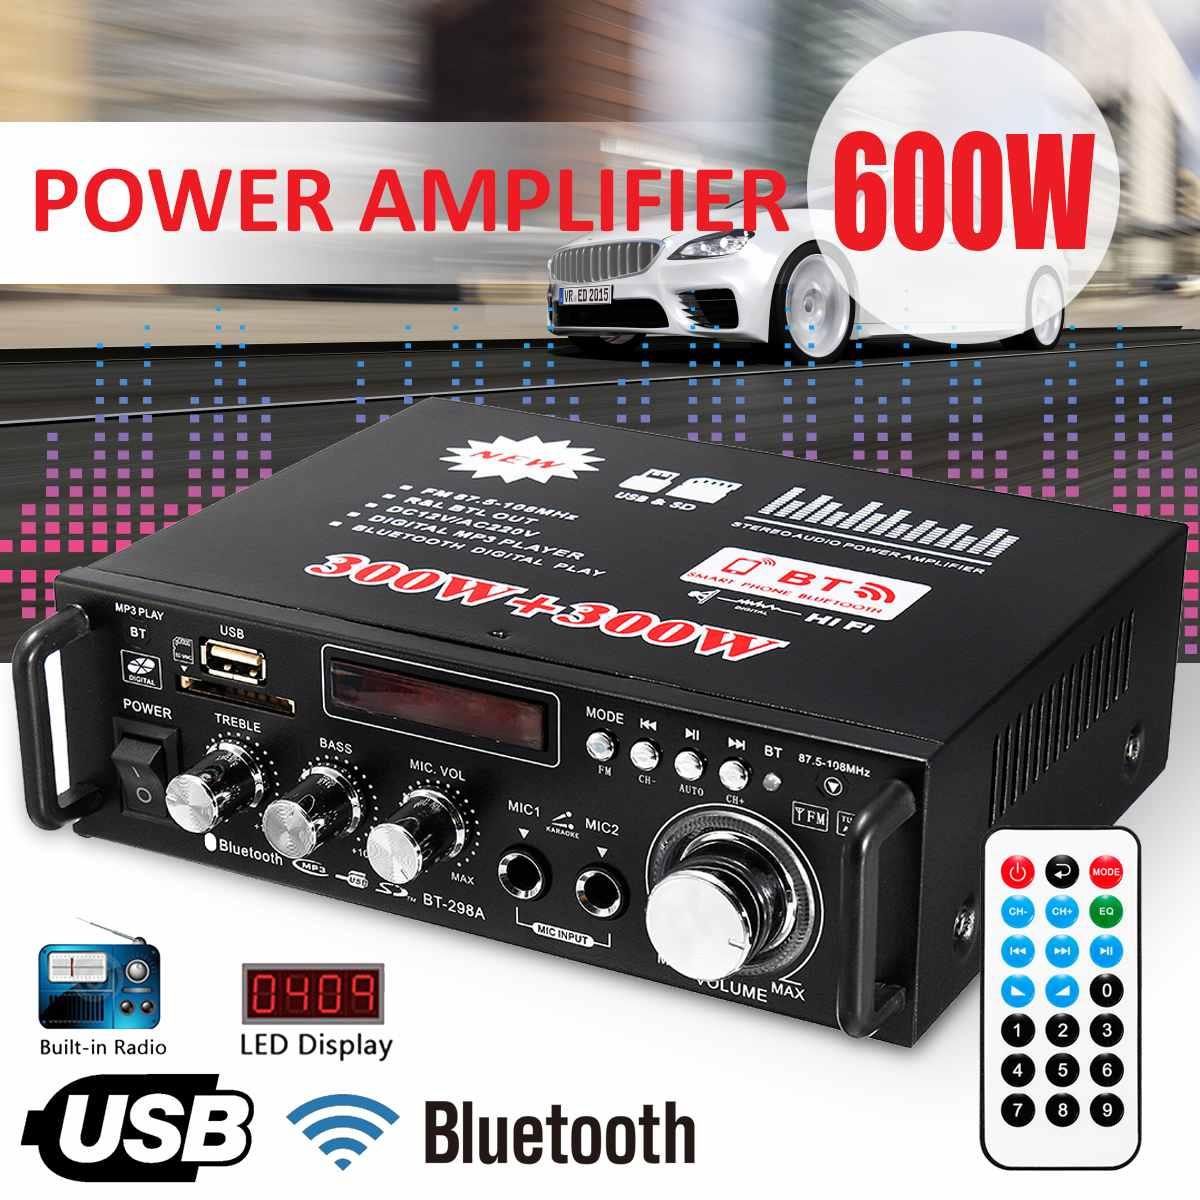 12V/ 220V BT-298A 2CH LCD Display Digital HIFI Audio Stereo Power Amplifier Blue